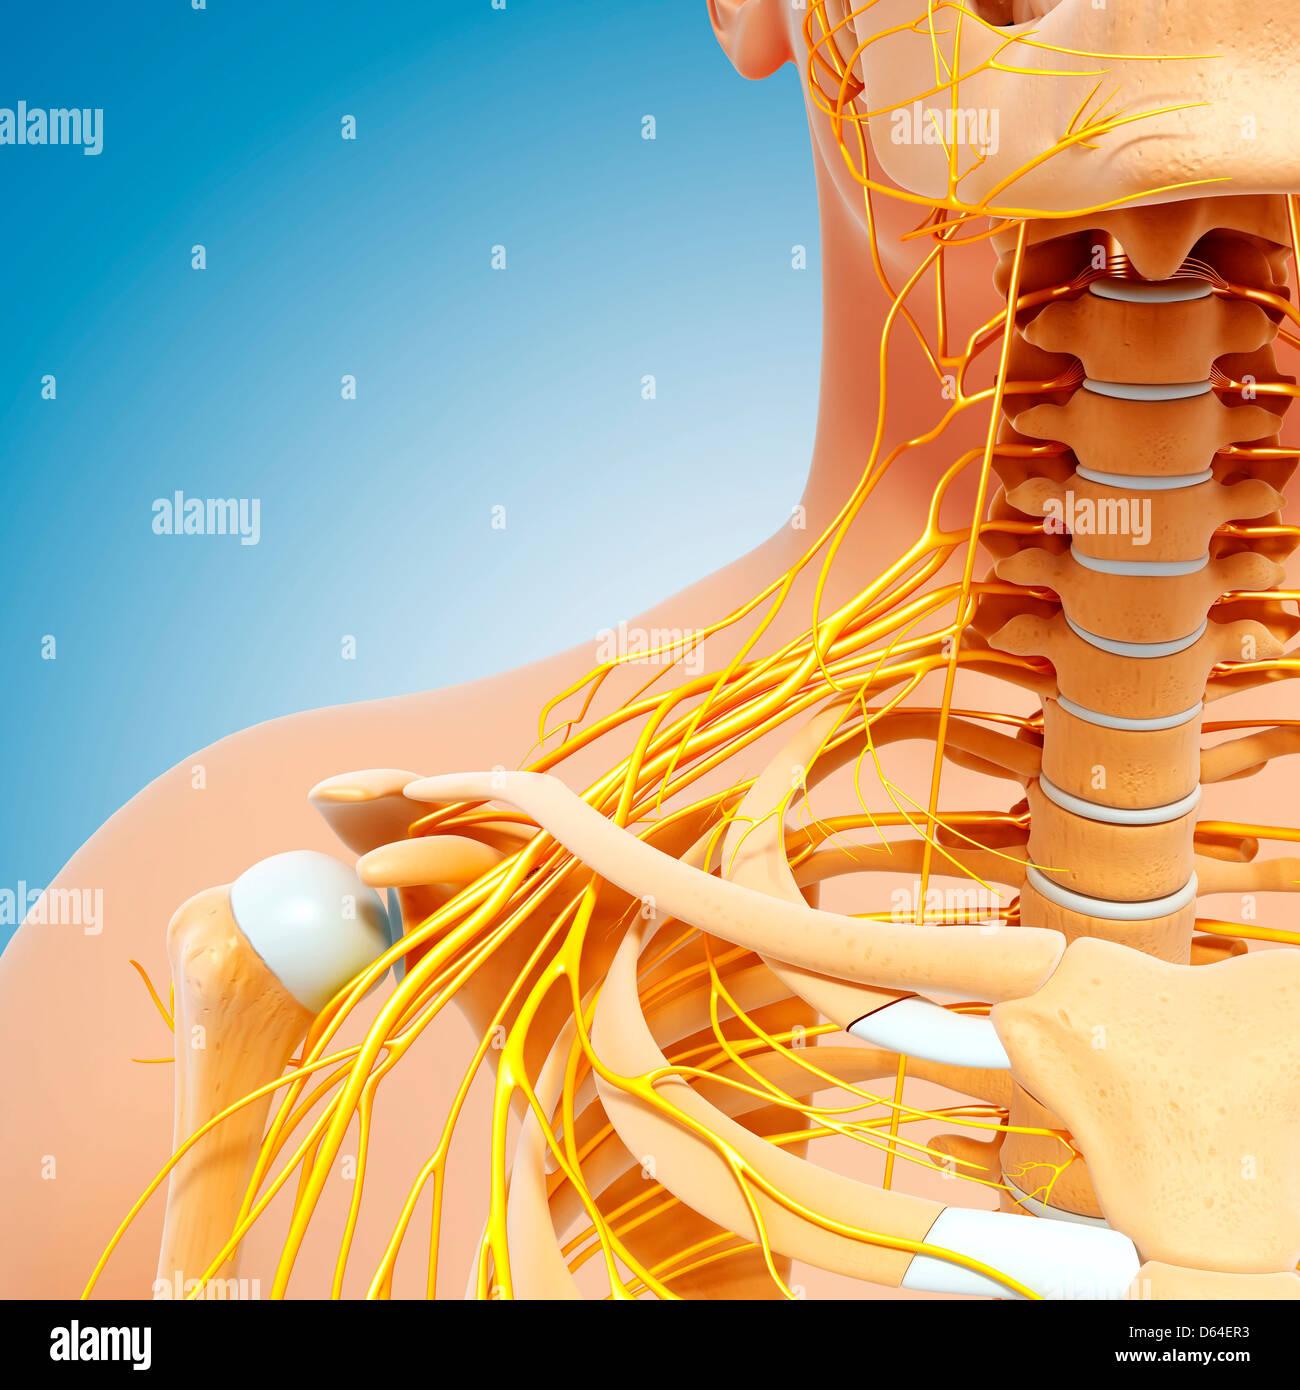 Schulter Anatomie, Kunstwerk Stockfoto, Bild: 55418471 - Alamy